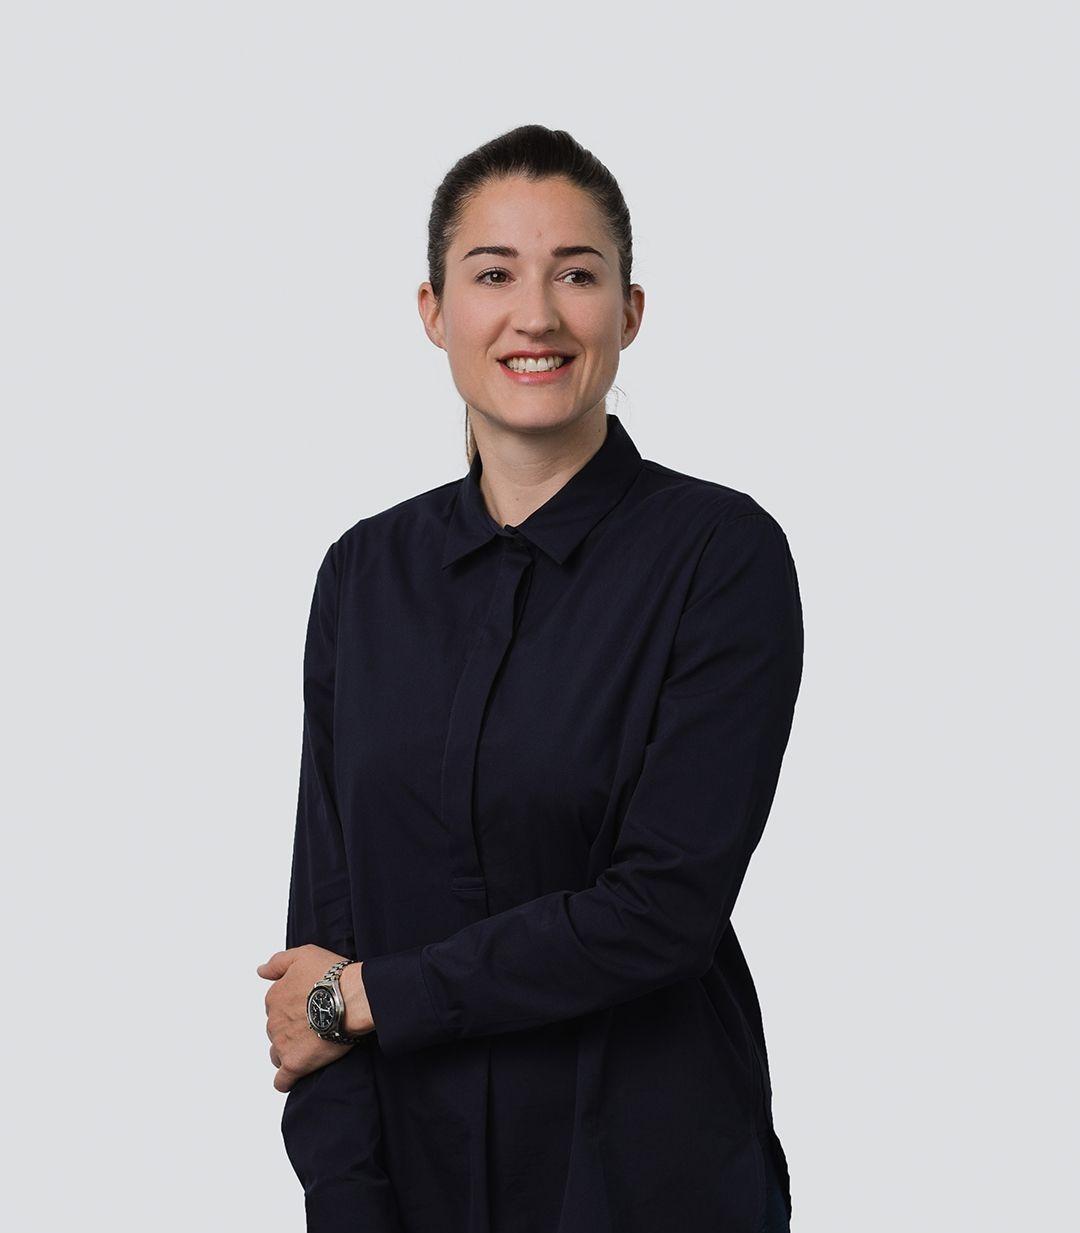 Simone Saner